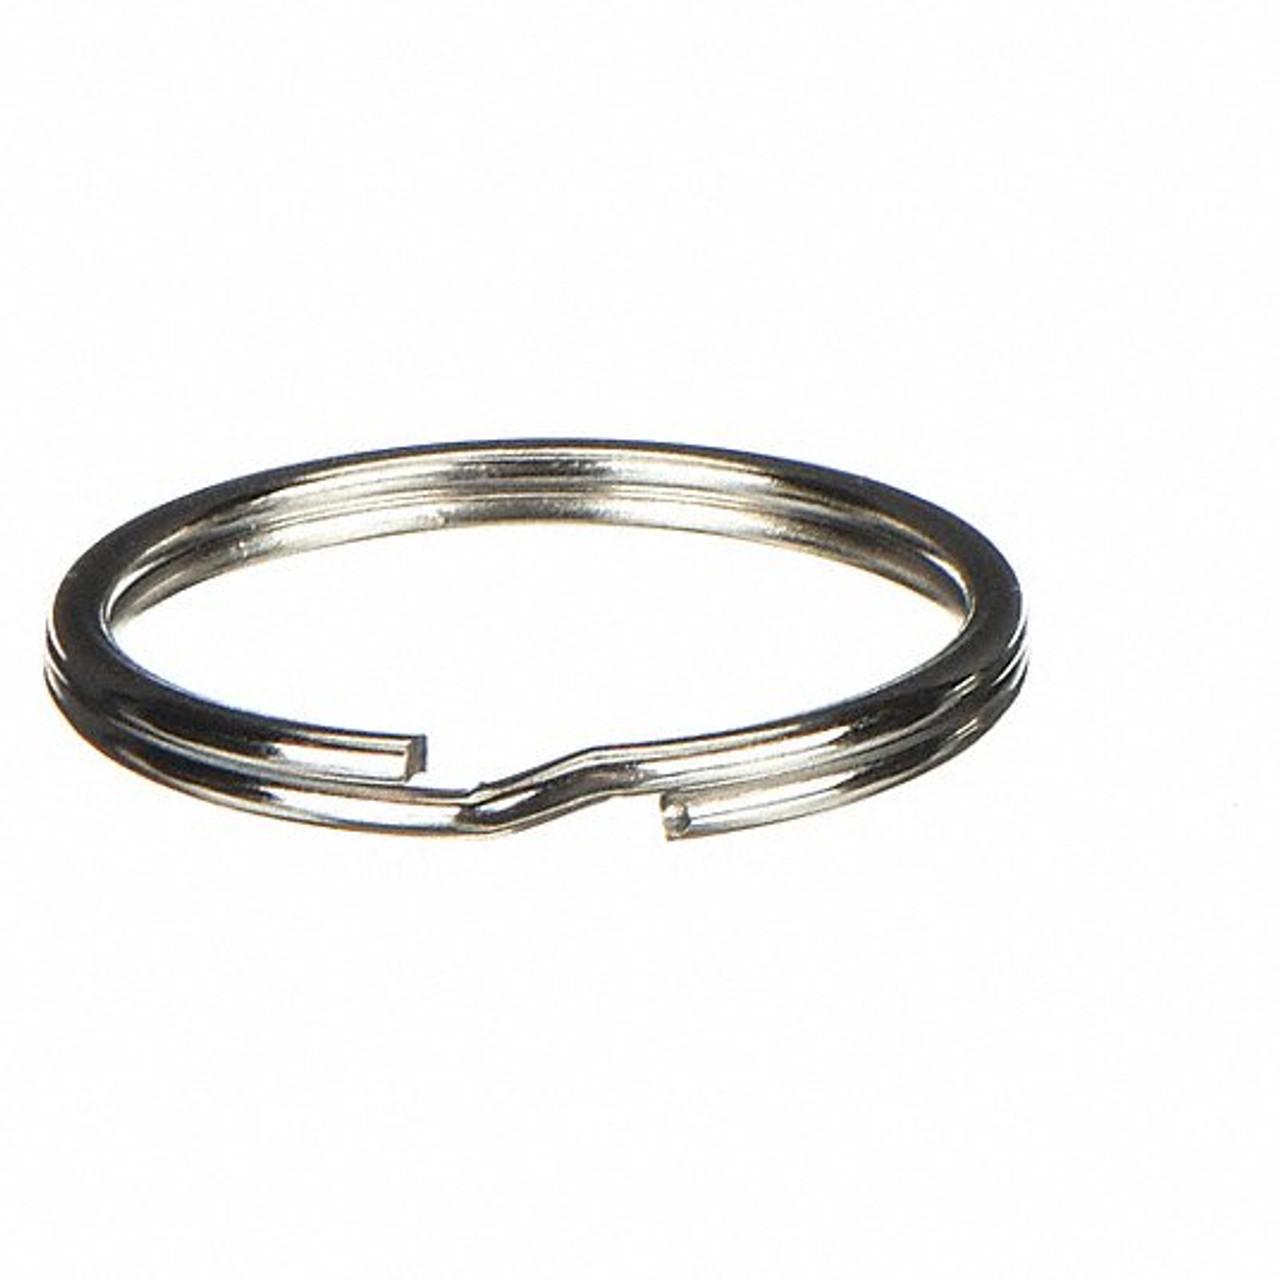 Single nickel plated key rings 15mm diameter as measured from the inside.